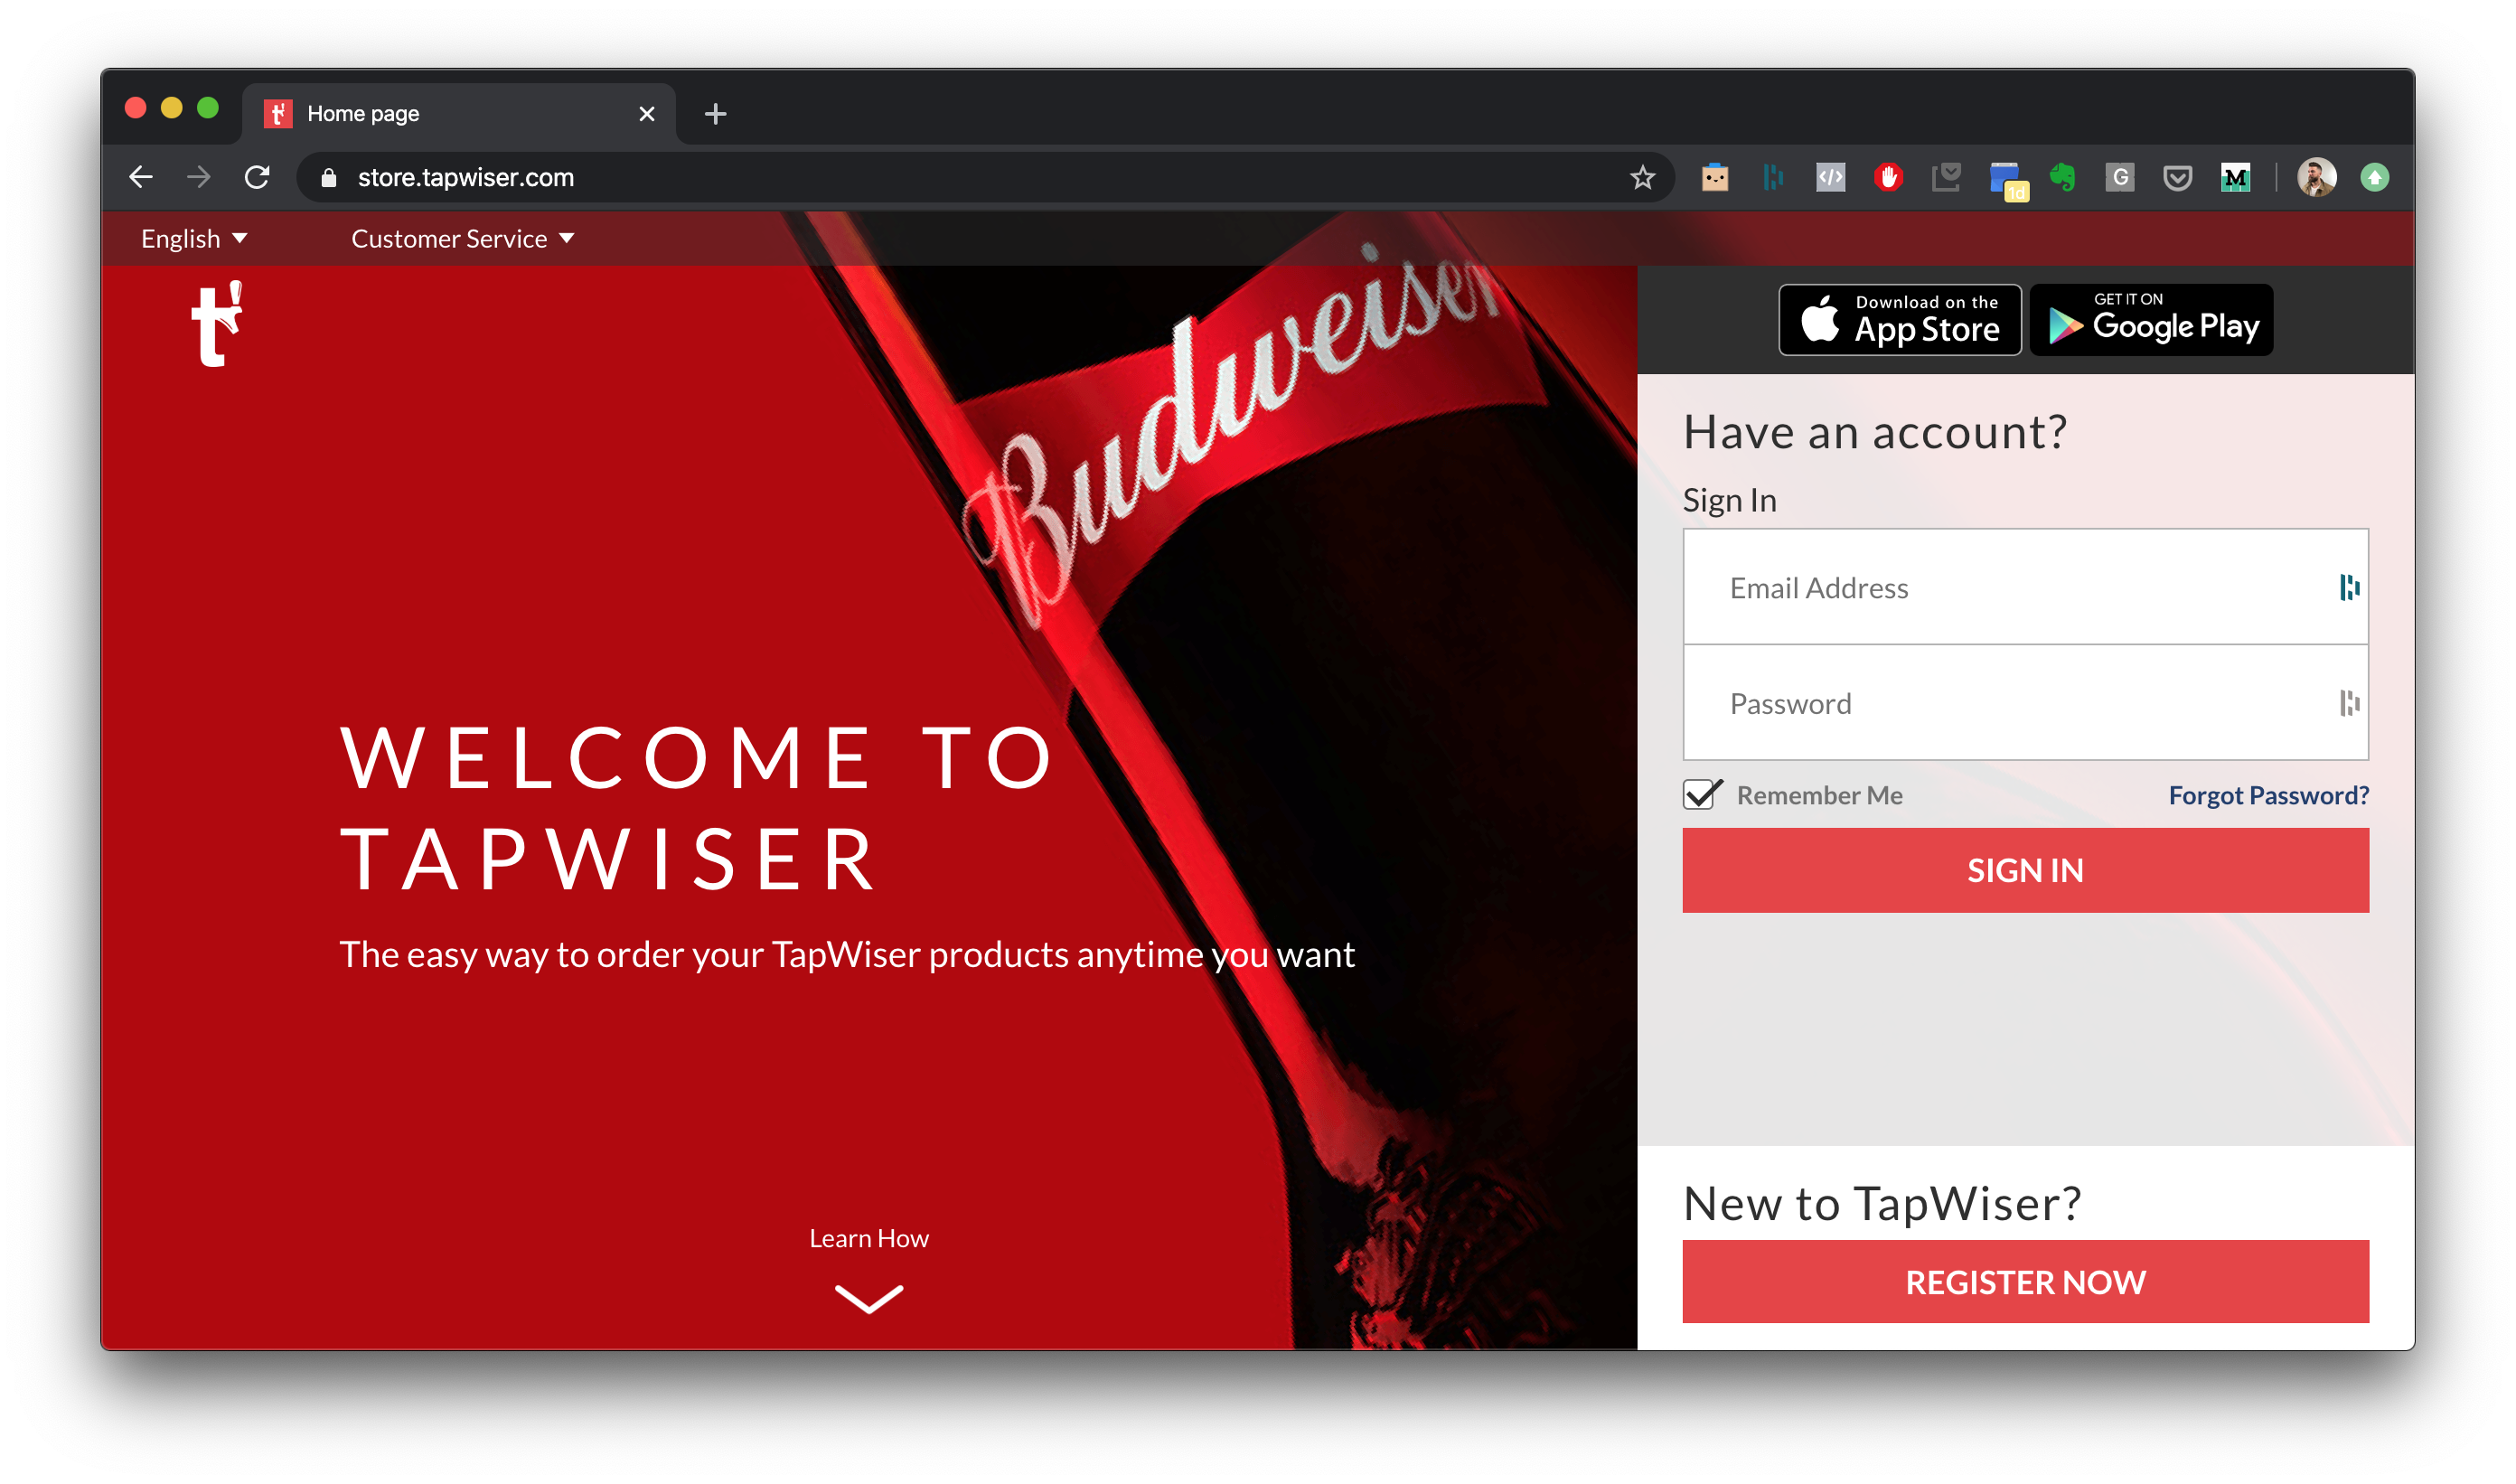 Tapwiser for ABInbev